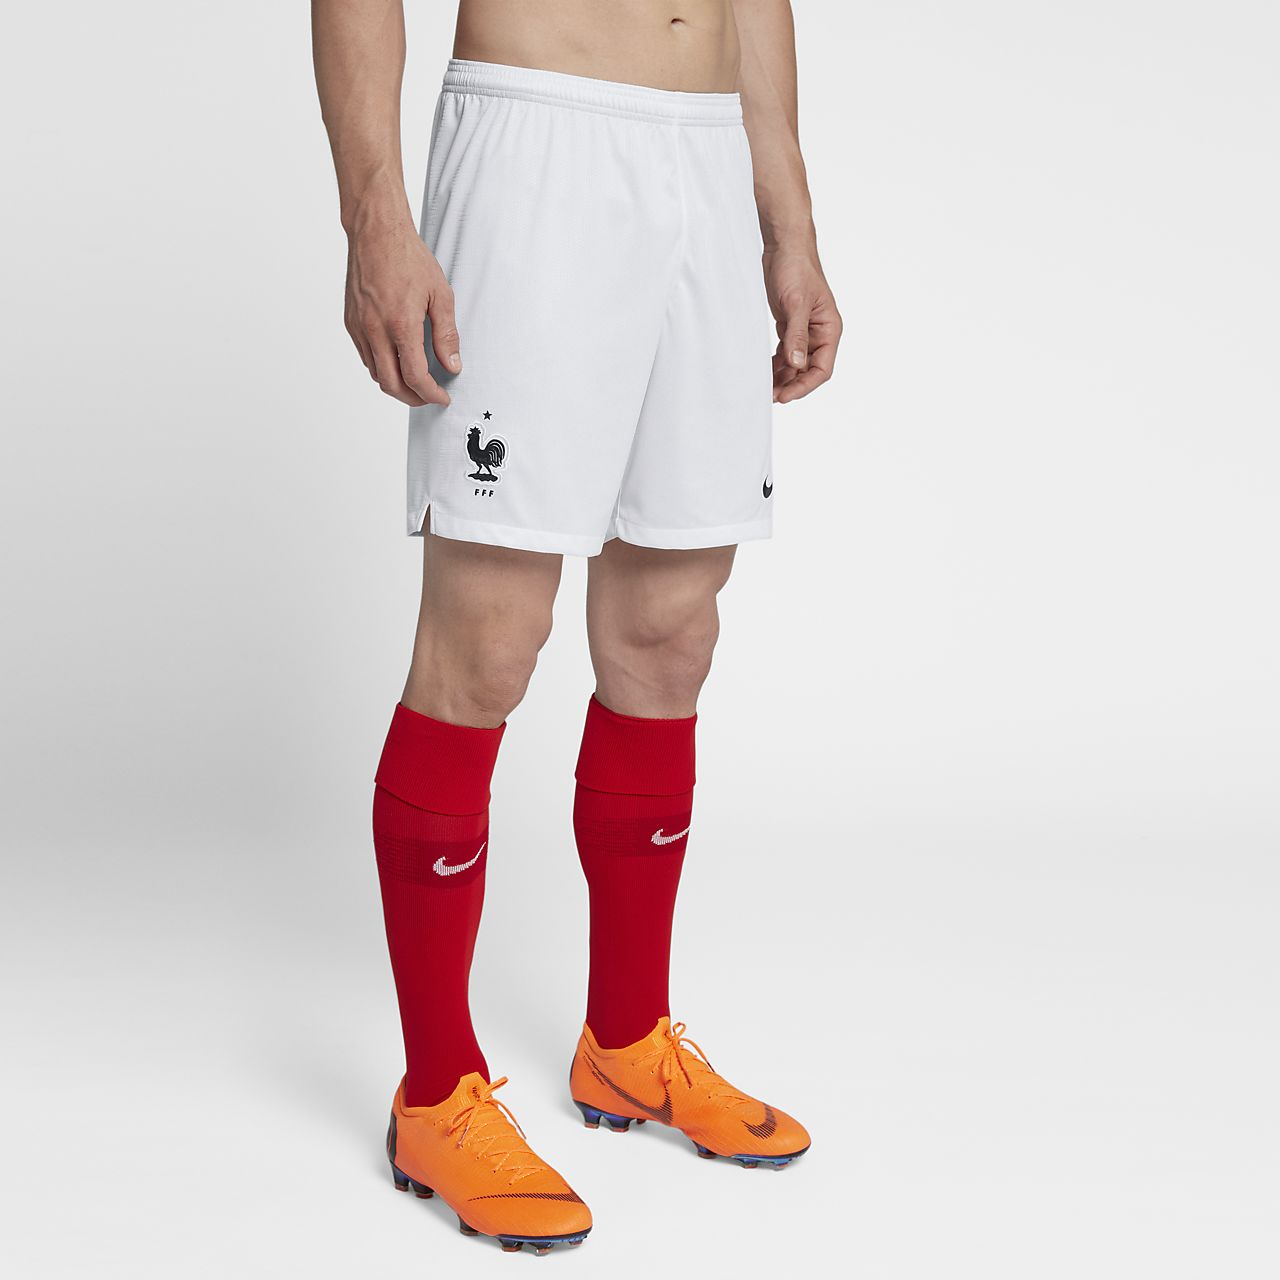 8c73cd0eb603 2018 FFF Stadium Home Men s Football Shorts. Nike.com GB